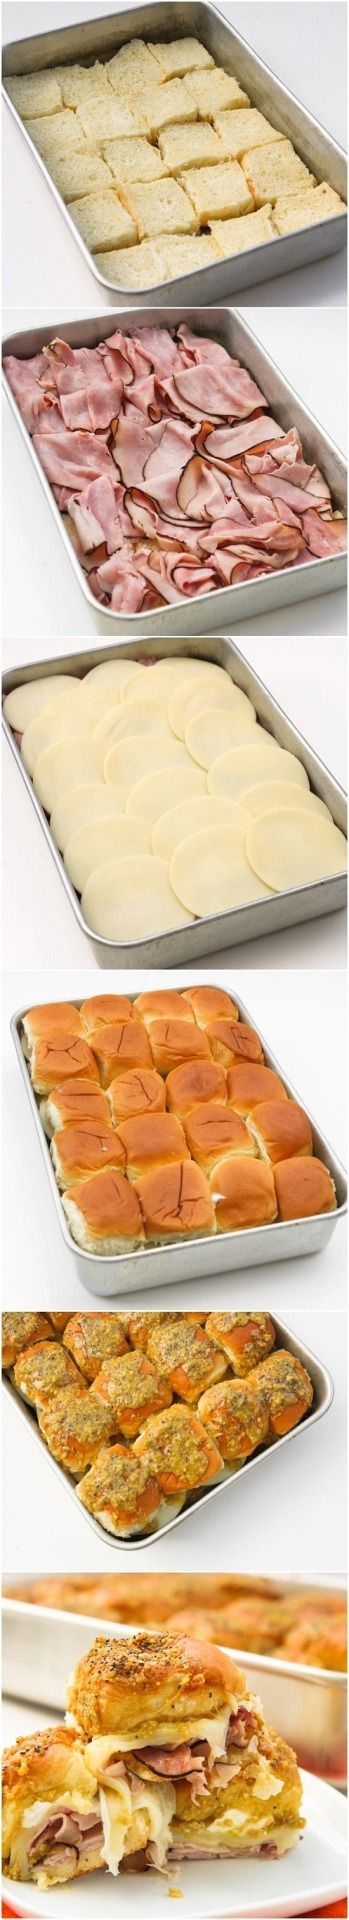 easy. cheap. potlucks for the next decade solved. thank you.